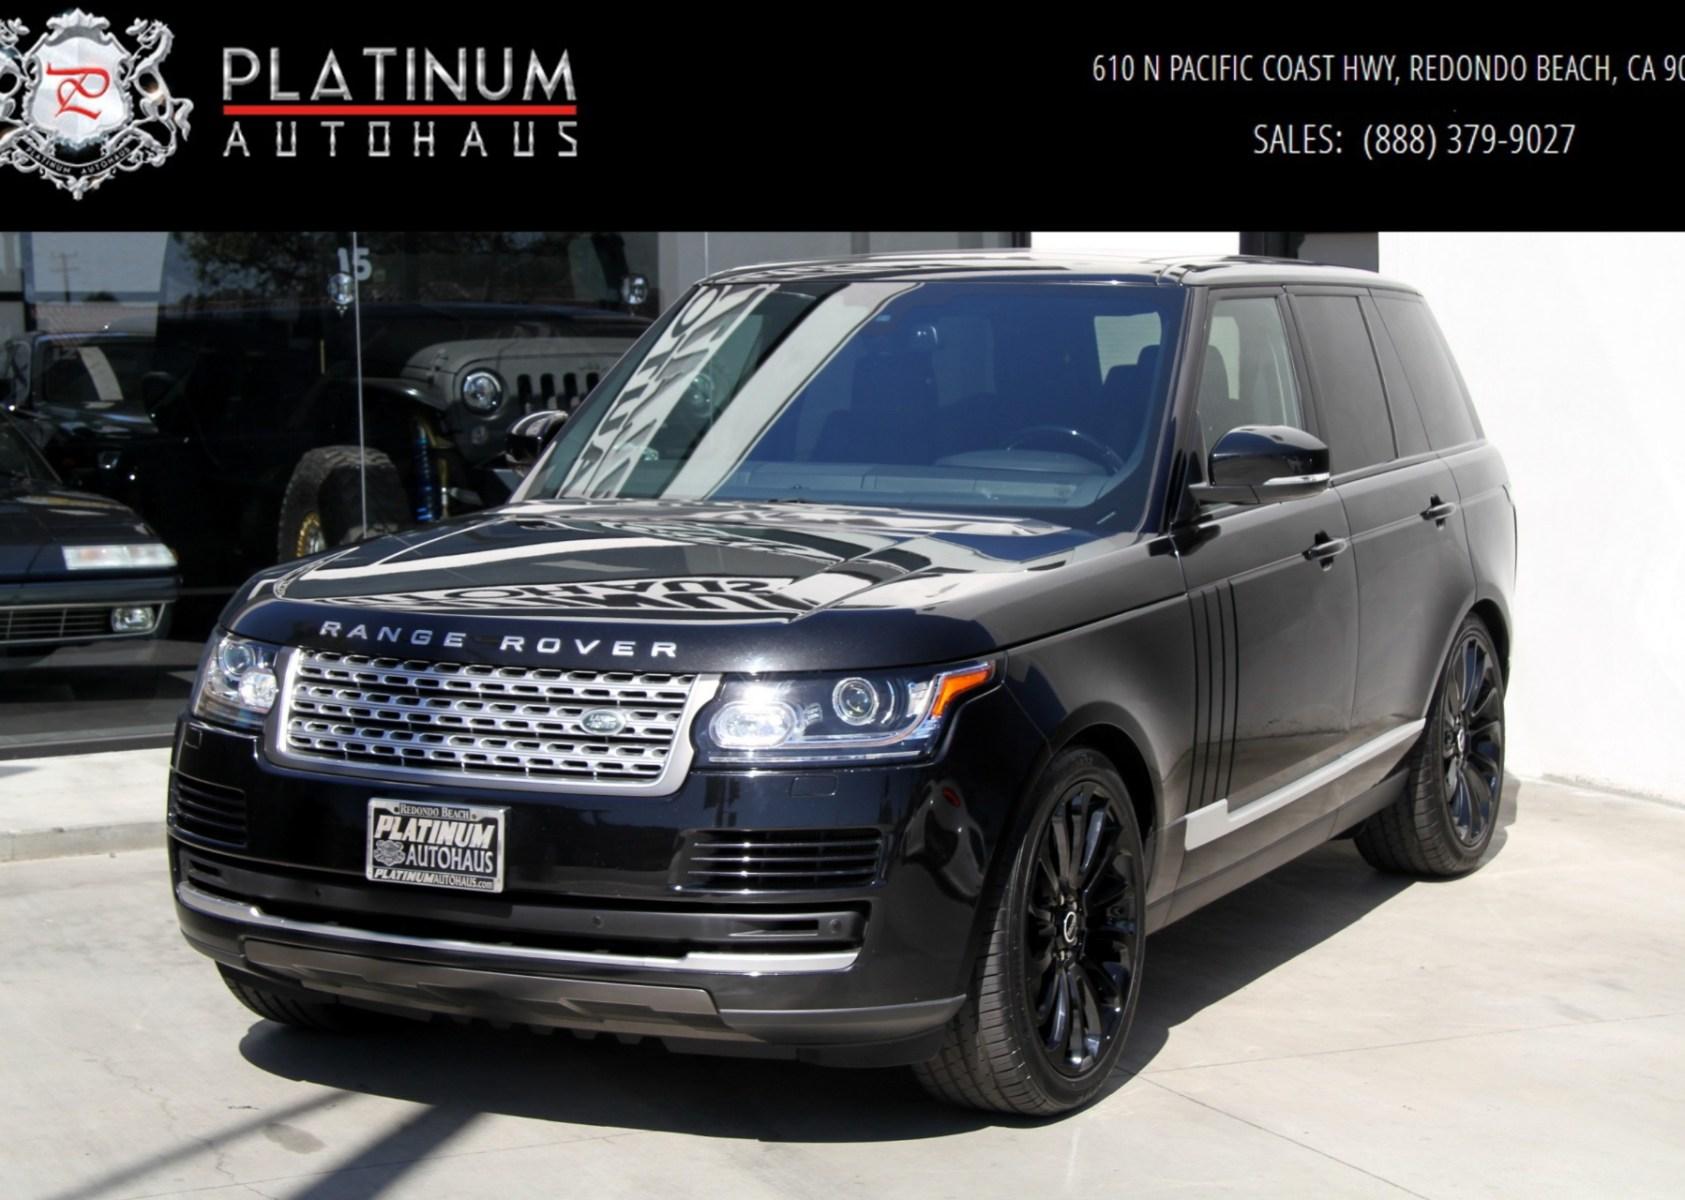 2015 Land Rover Range Rover HSE Stock 5972 for sale near Redondo